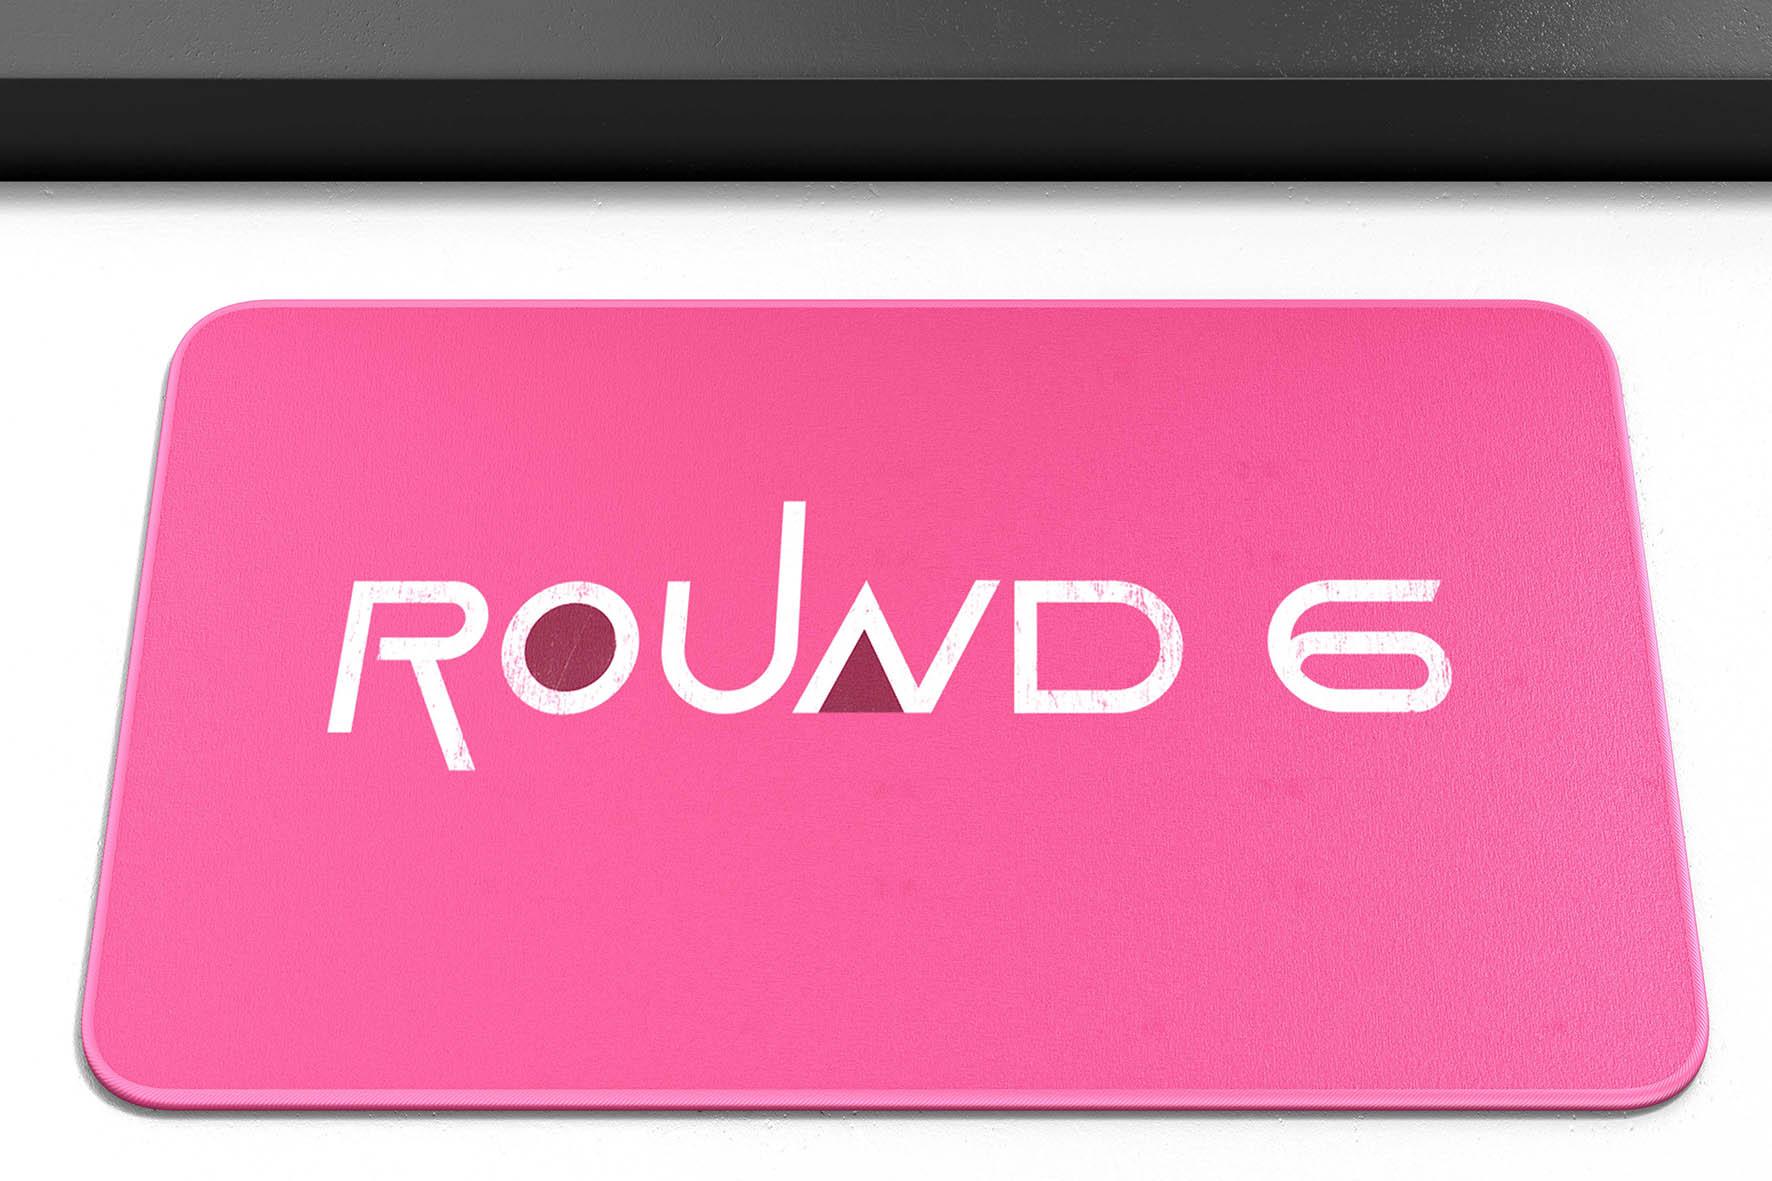 Tapete Capacho Poliéster Round 6 Squid Game Logo Rosa Netflix - EV